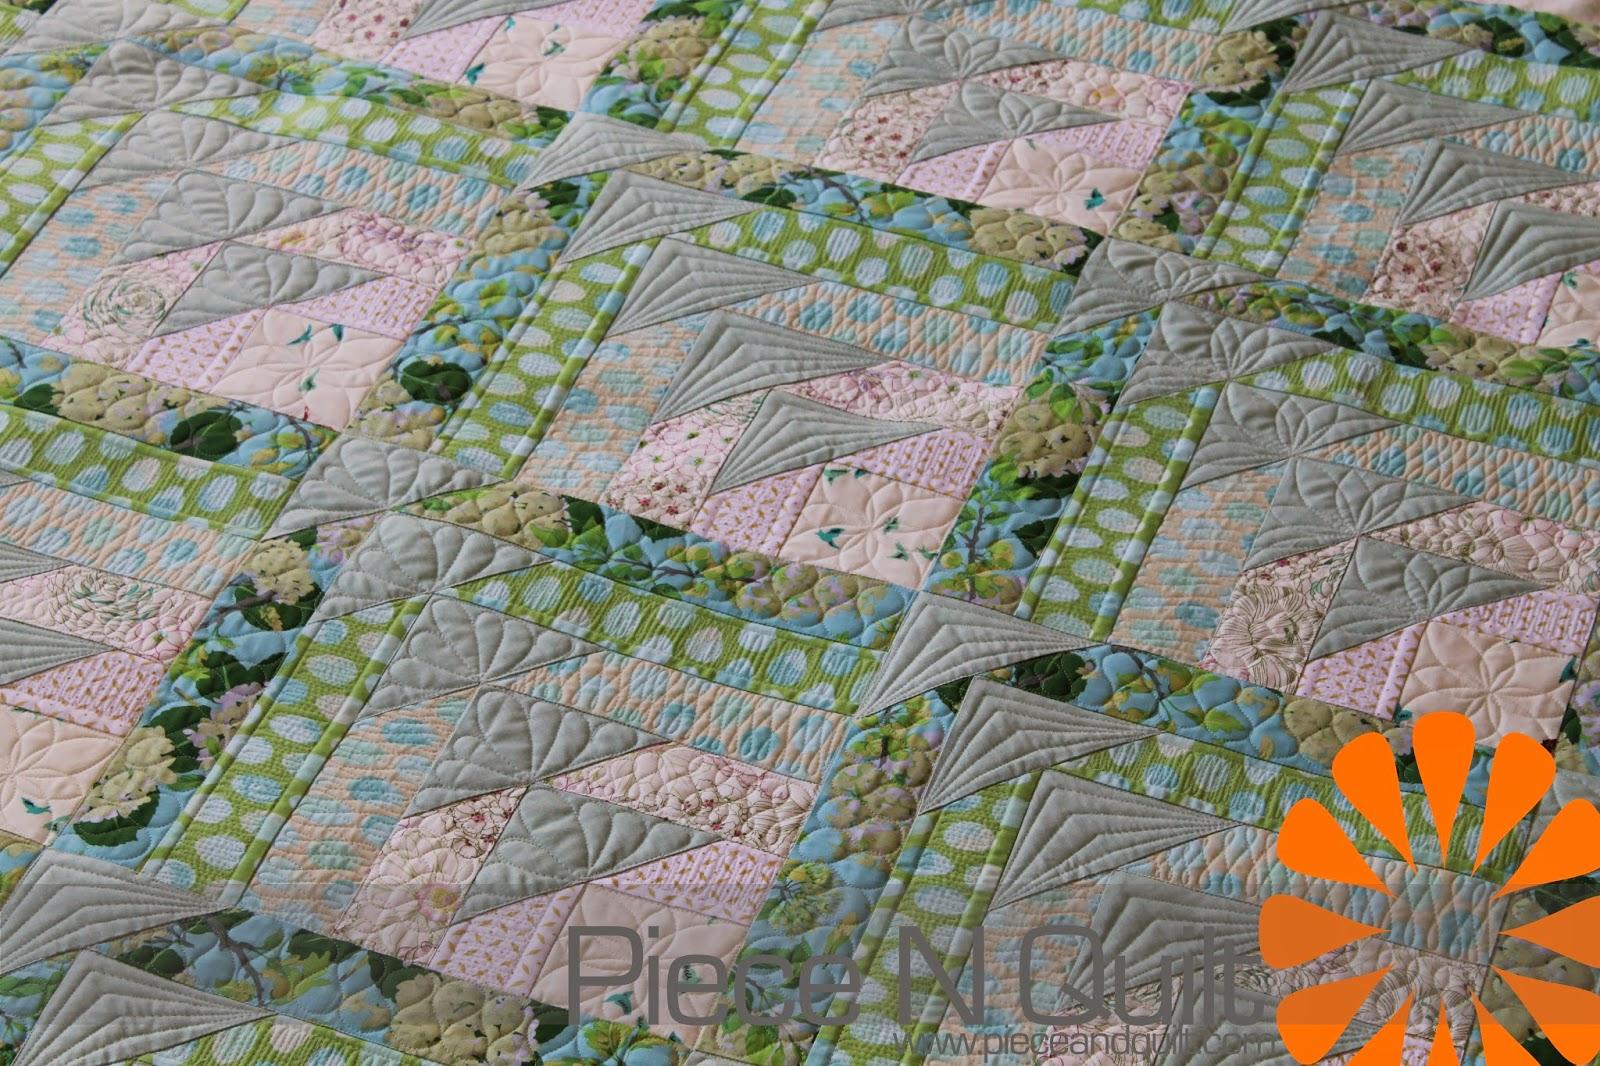 Piece N Quilt Custom Machine Quilting Sharing Some Quilting Ideas